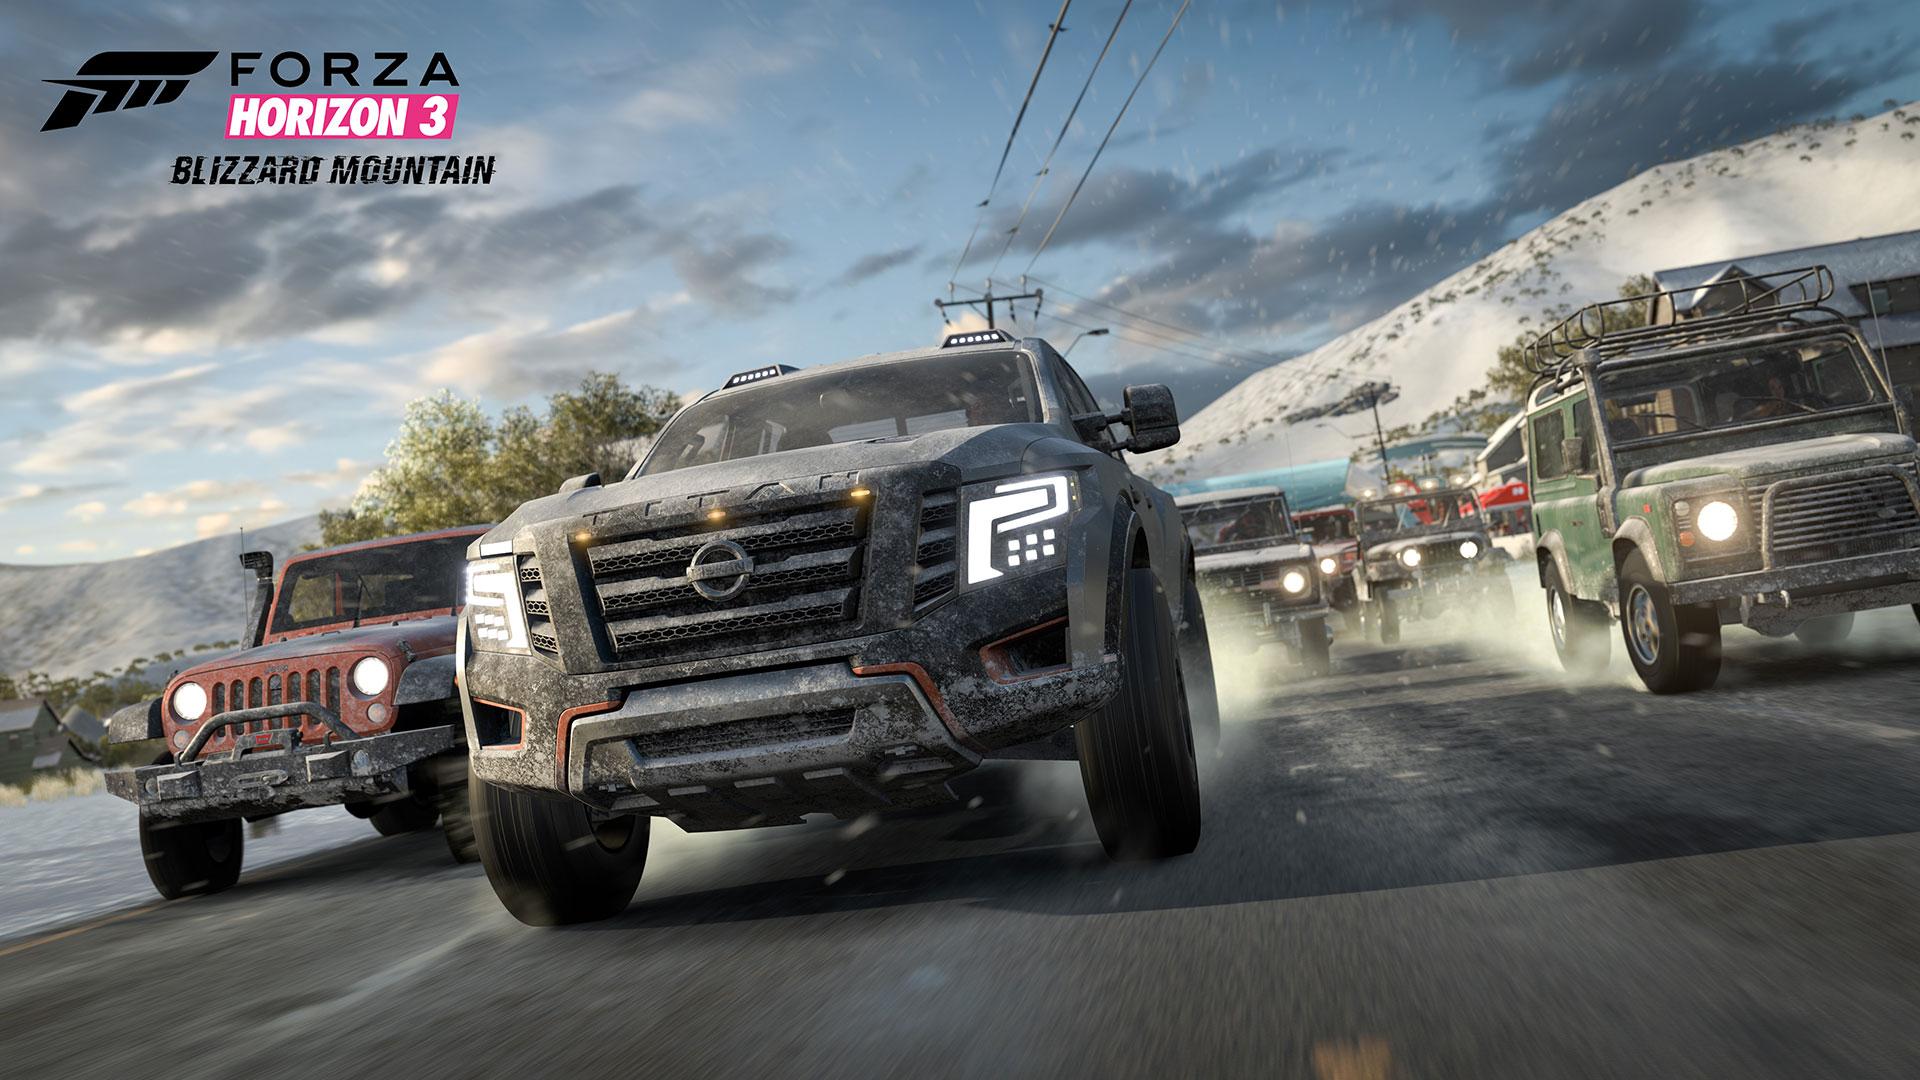 Forza Horizon 3 Blizzard Mountain screenshot 3